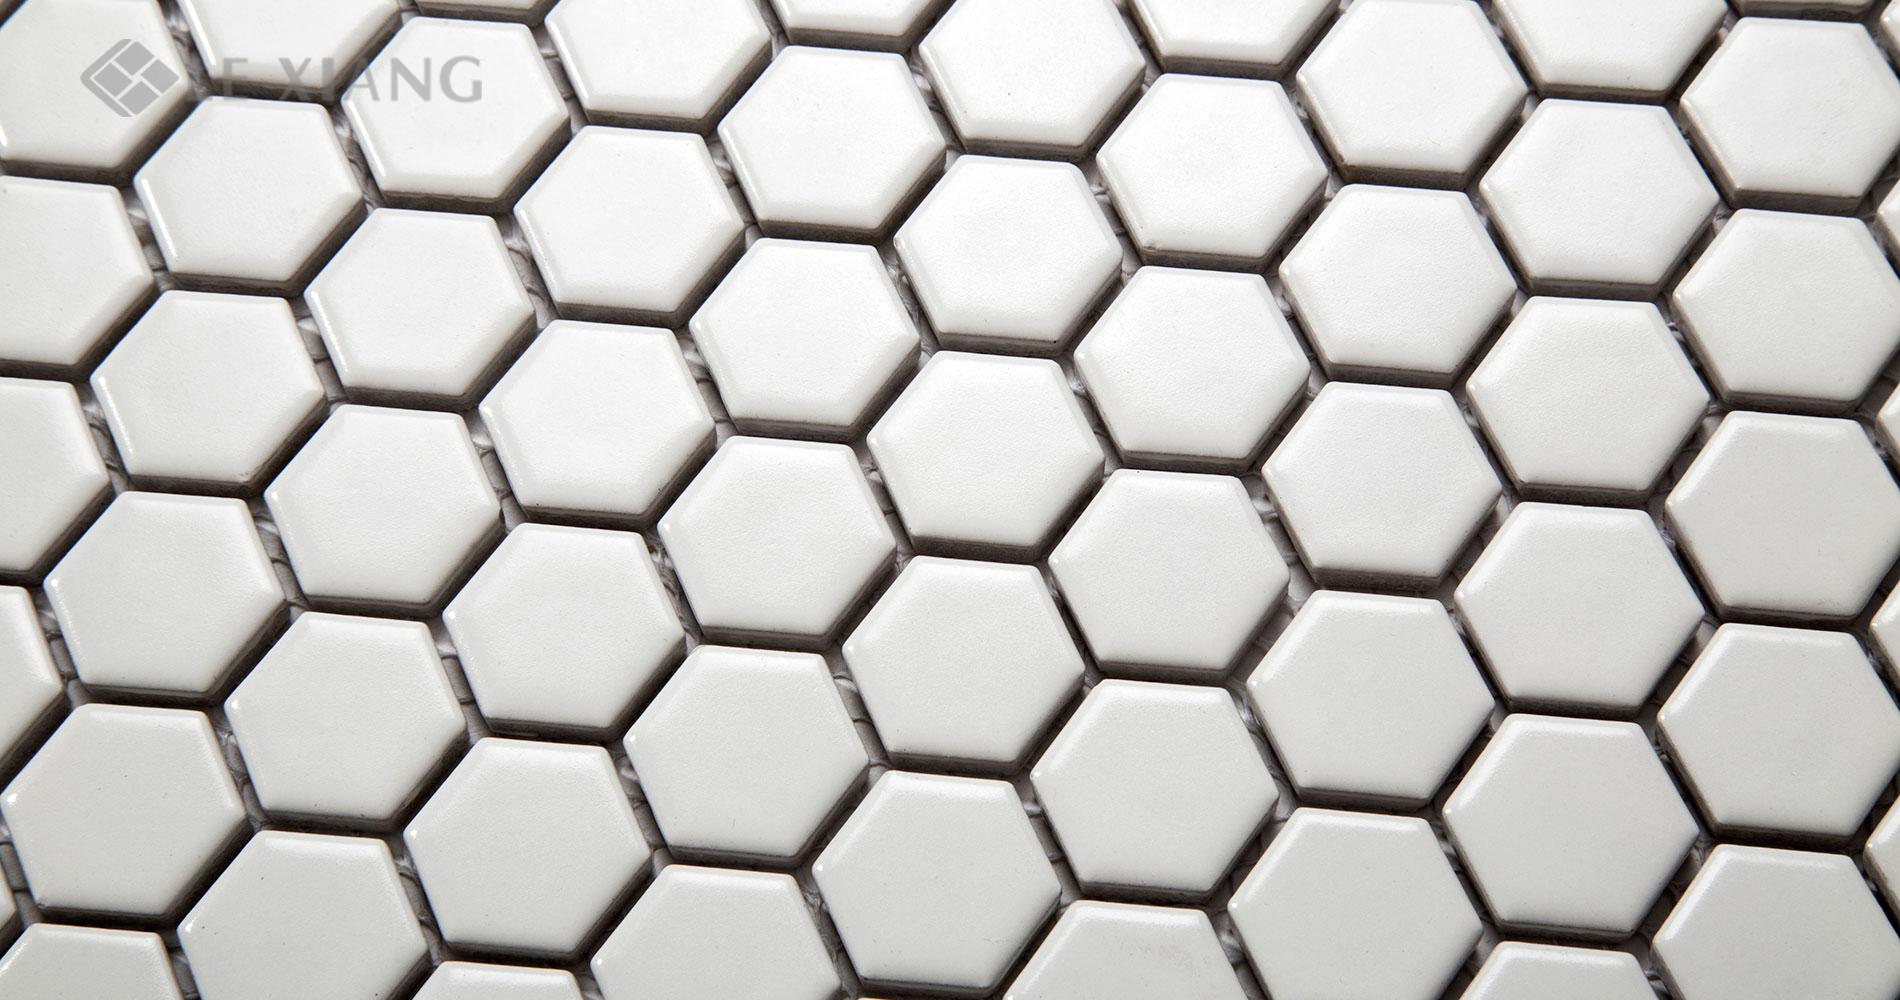 Porcelain-Hexagon-Mosaic-Tile-For-Bathroom-Wall-Flooring-Tiles-6